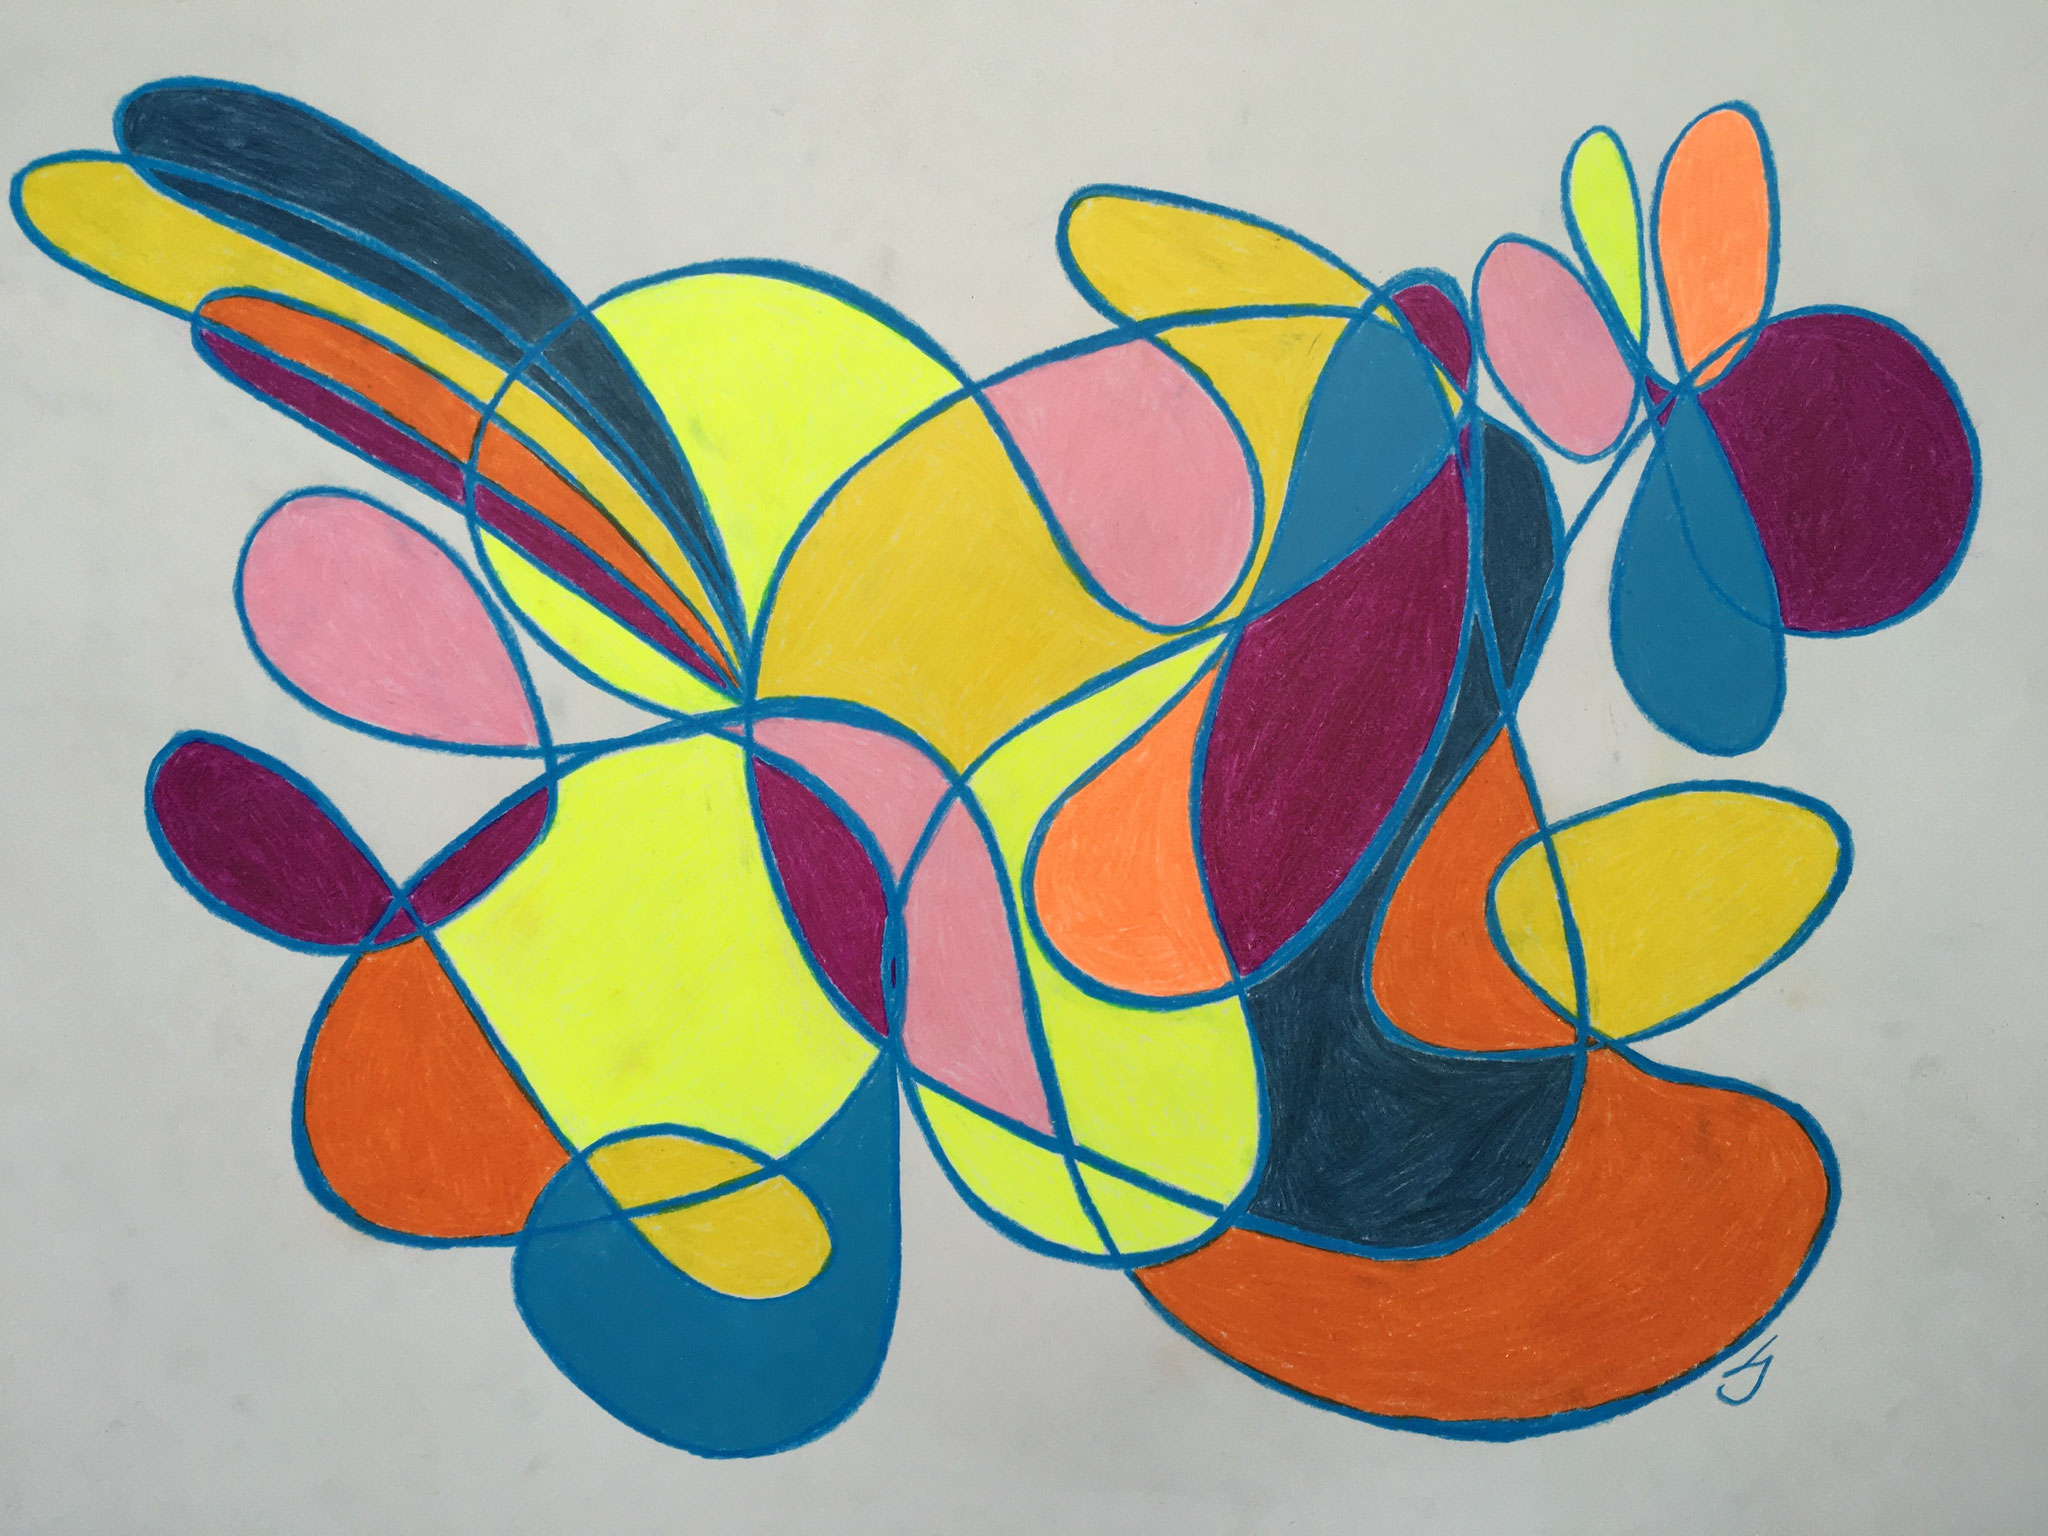 Pastellstift/Kreide, 42 x 59cm, 2021